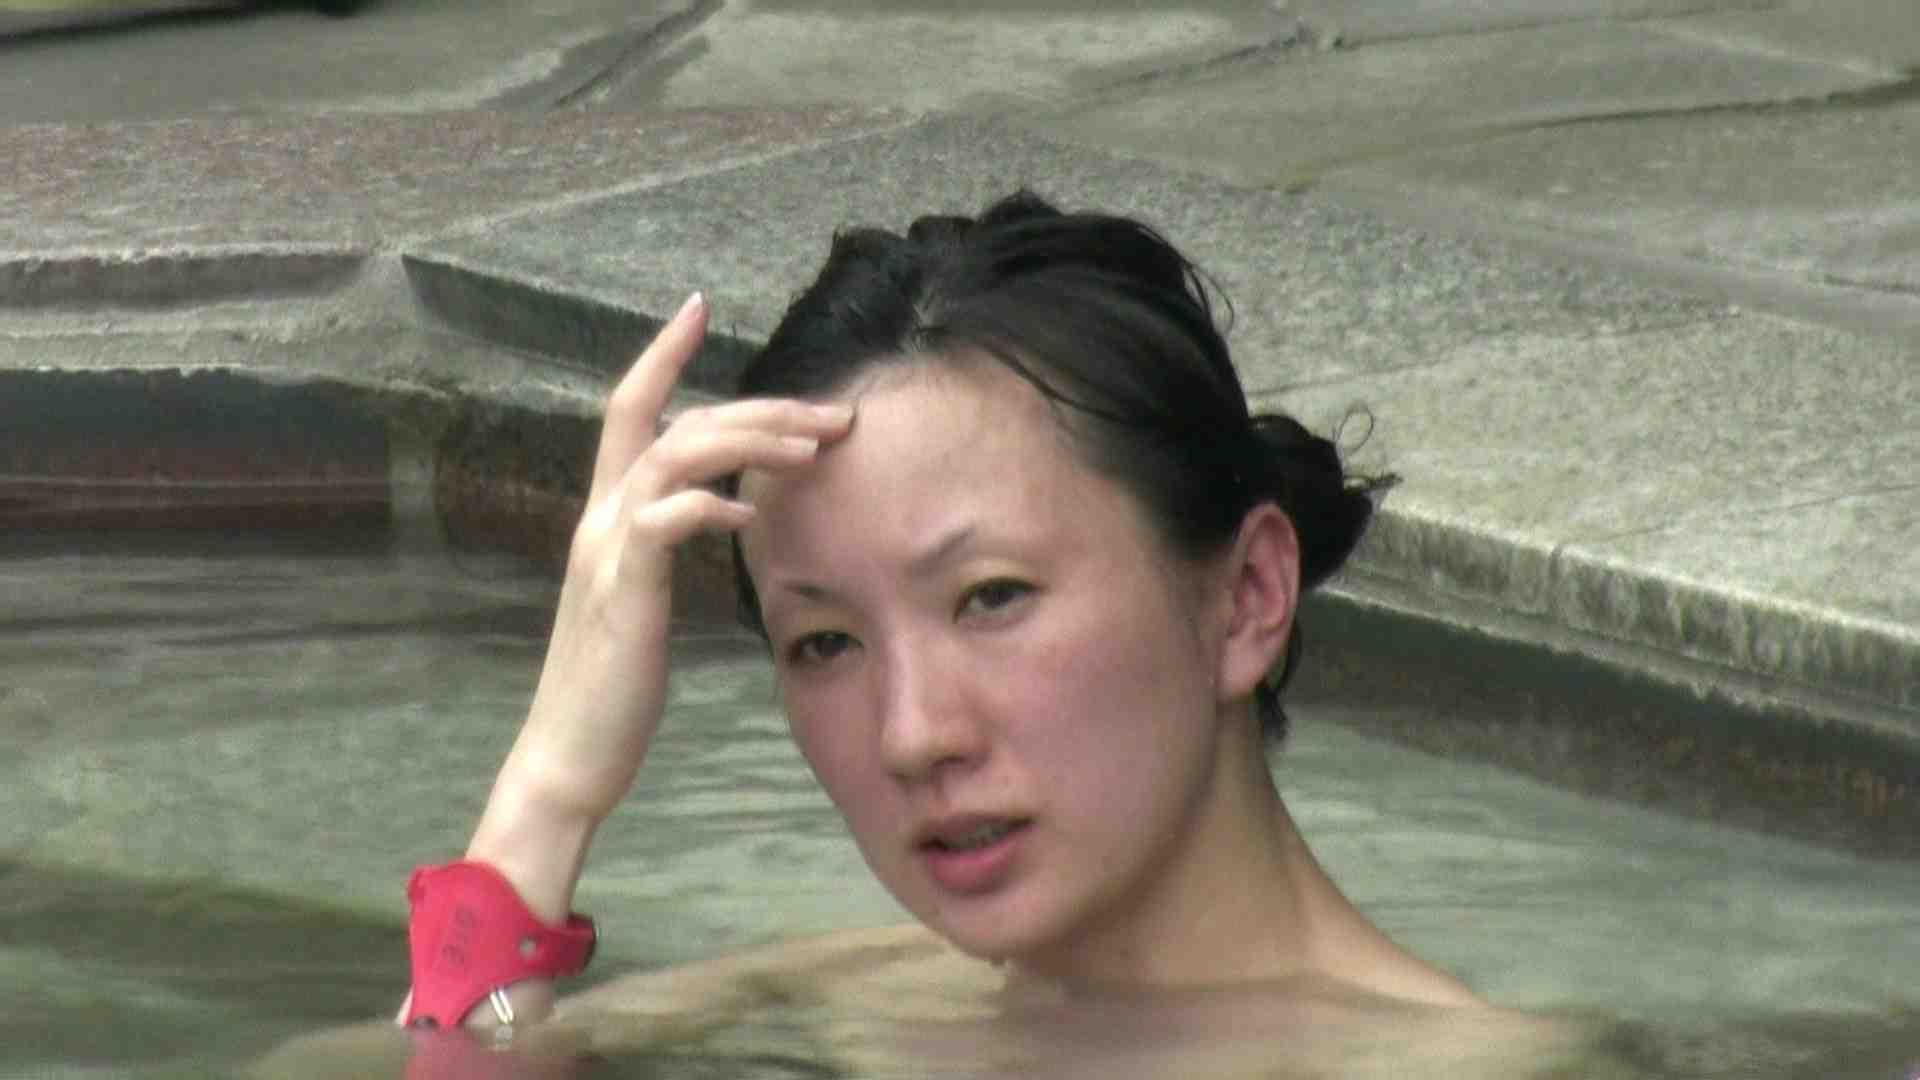 Aquaな露天風呂Vol.663 0  20連発 8